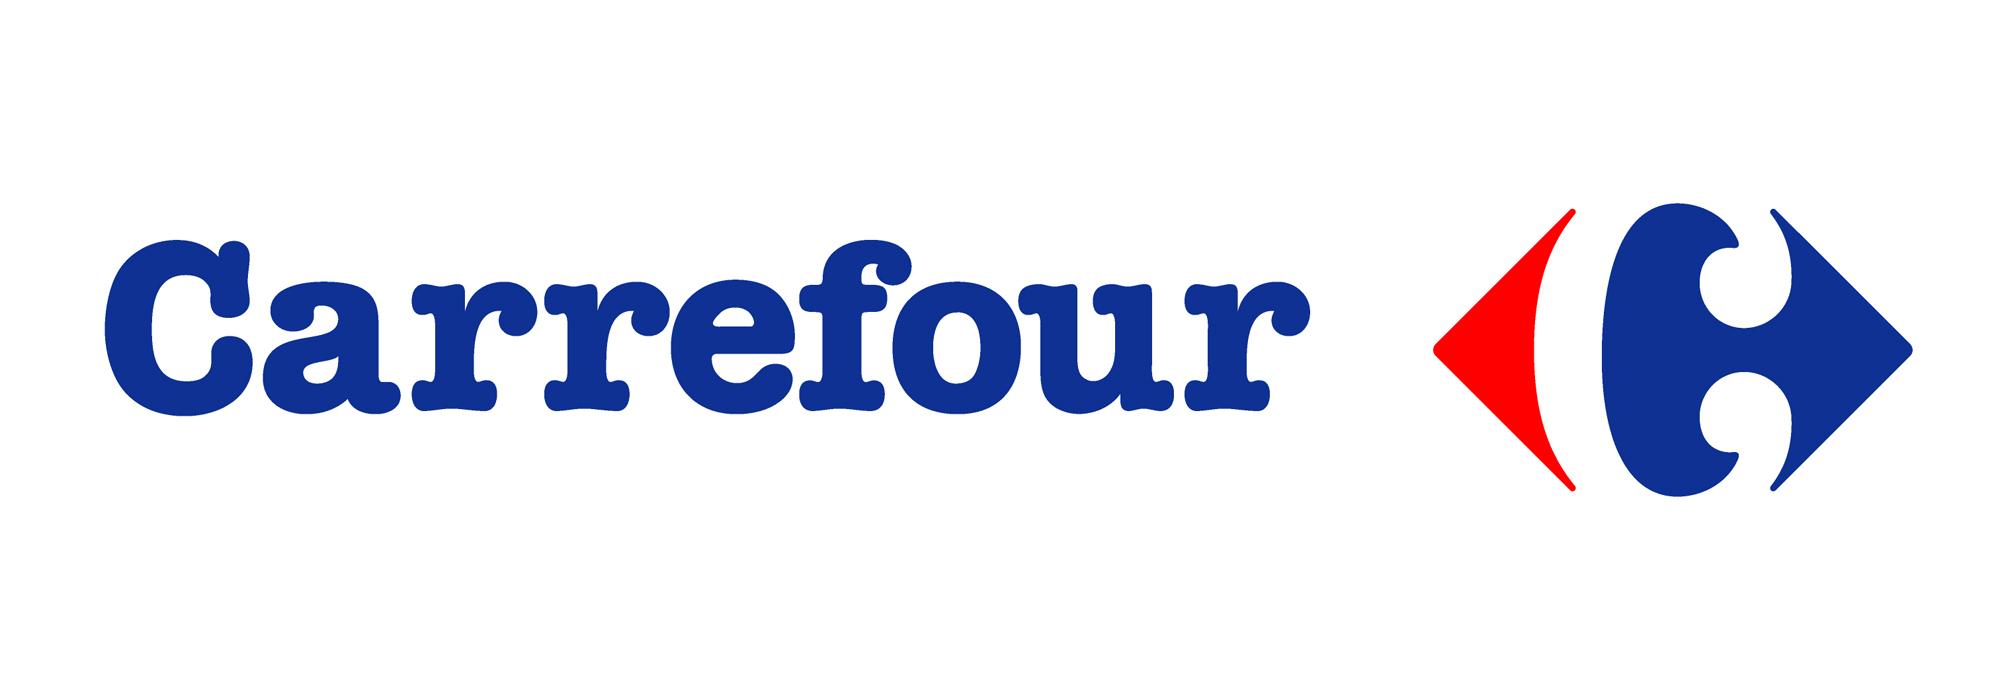 Carrefour Sa Spon logo